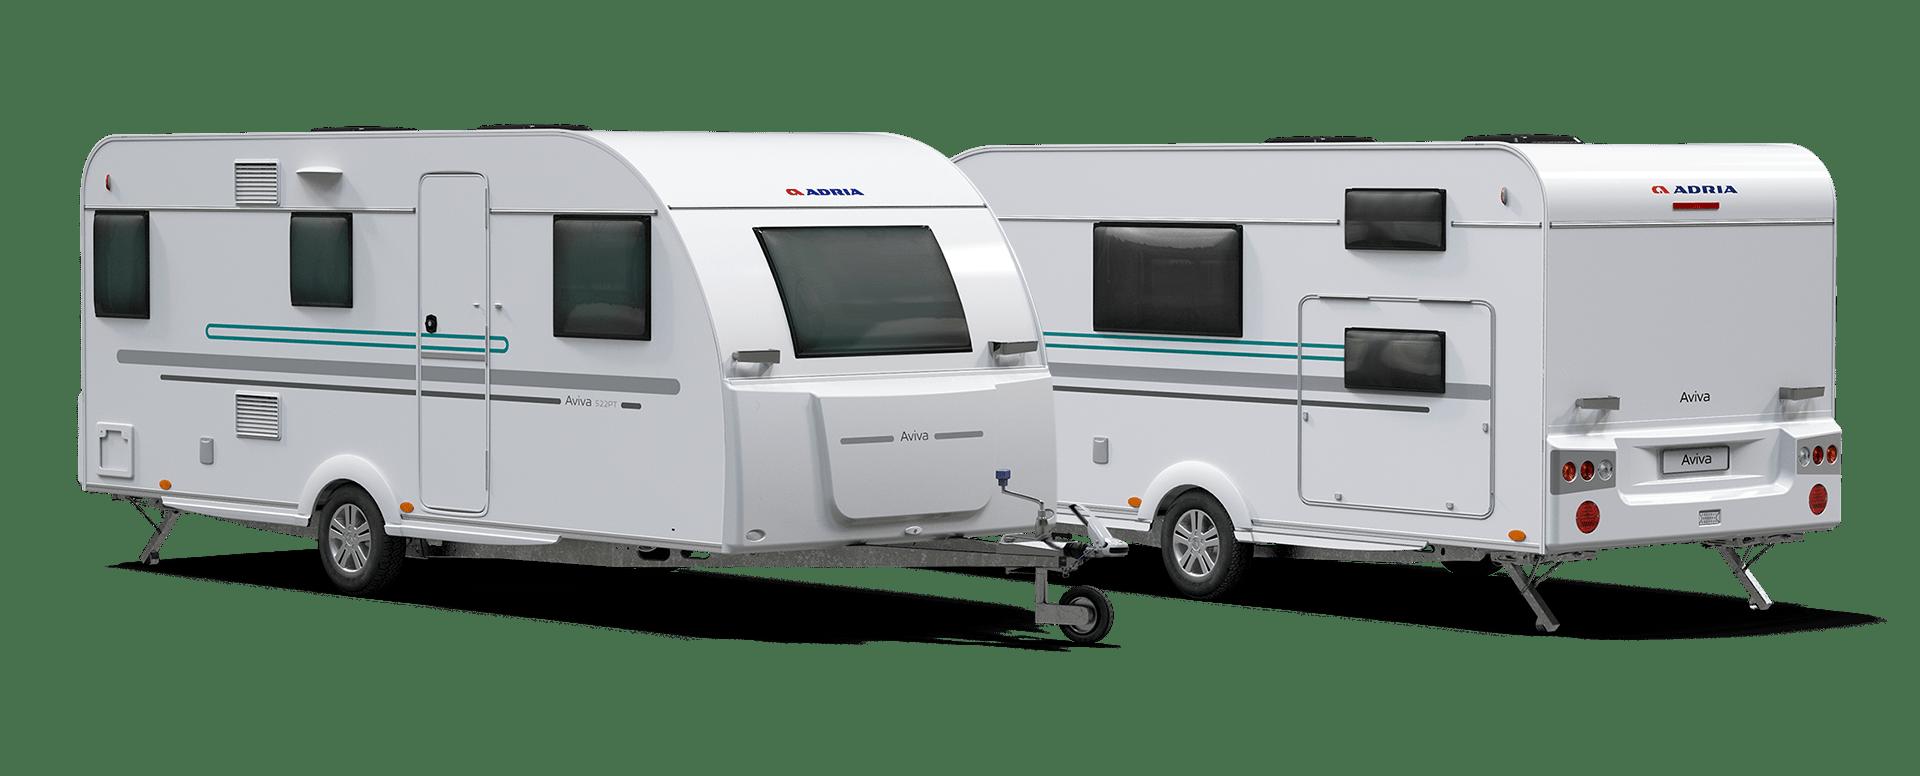 Modelo Caravana Adria Aviva 2019